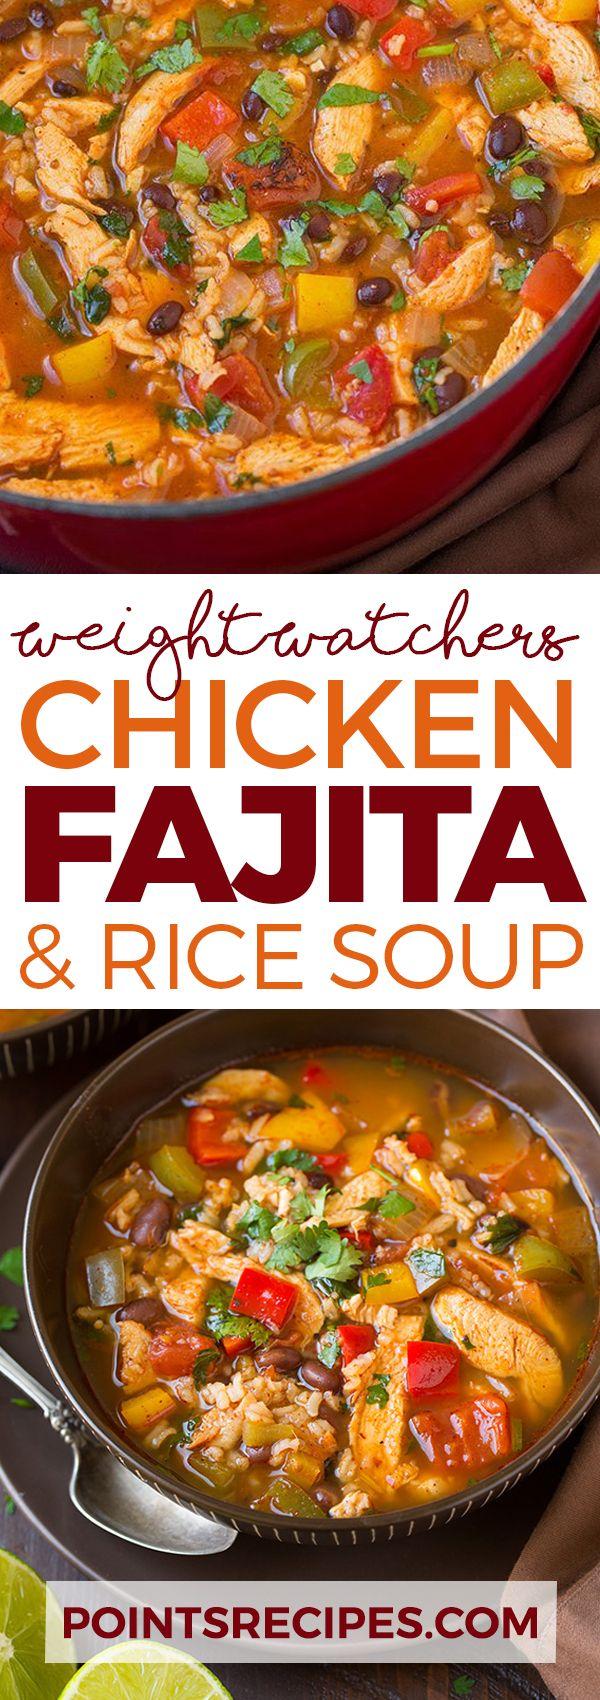 Chicken Fajita and Rice Soup - WEIGHT WATCHERS (Crockpot Recipes Weight Watchers)